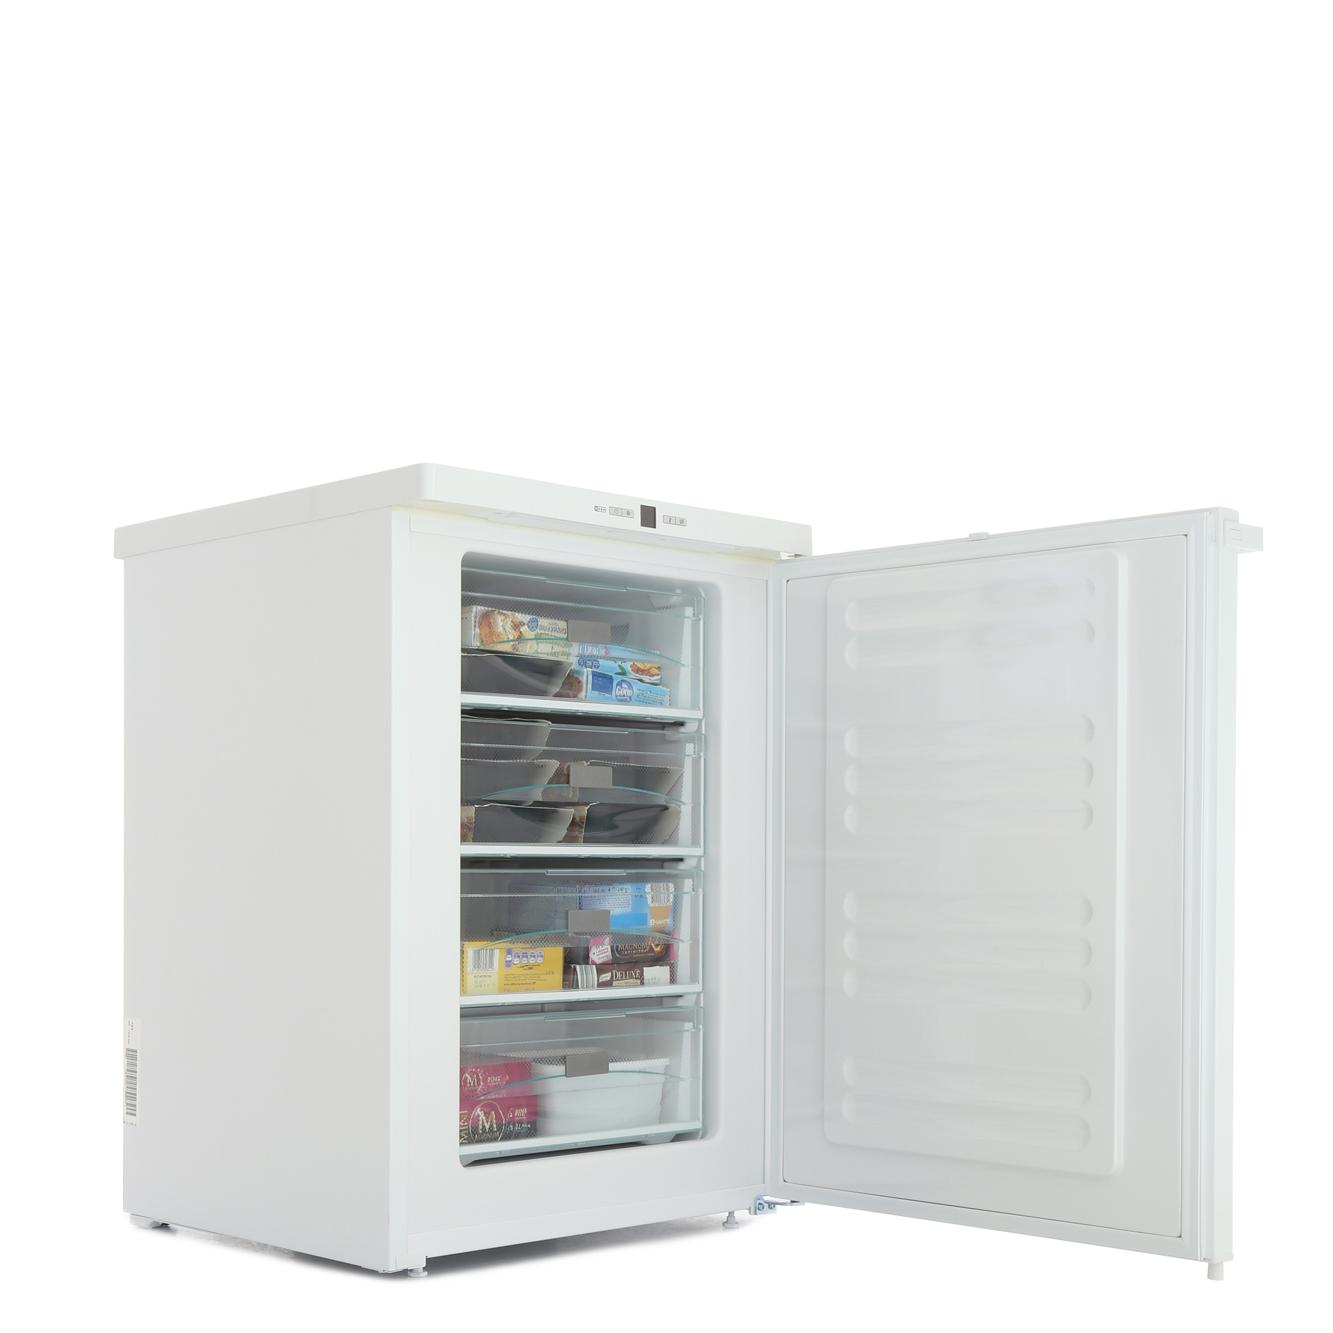 buy miele f12020s 2 freezer white marks electrical. Black Bedroom Furniture Sets. Home Design Ideas